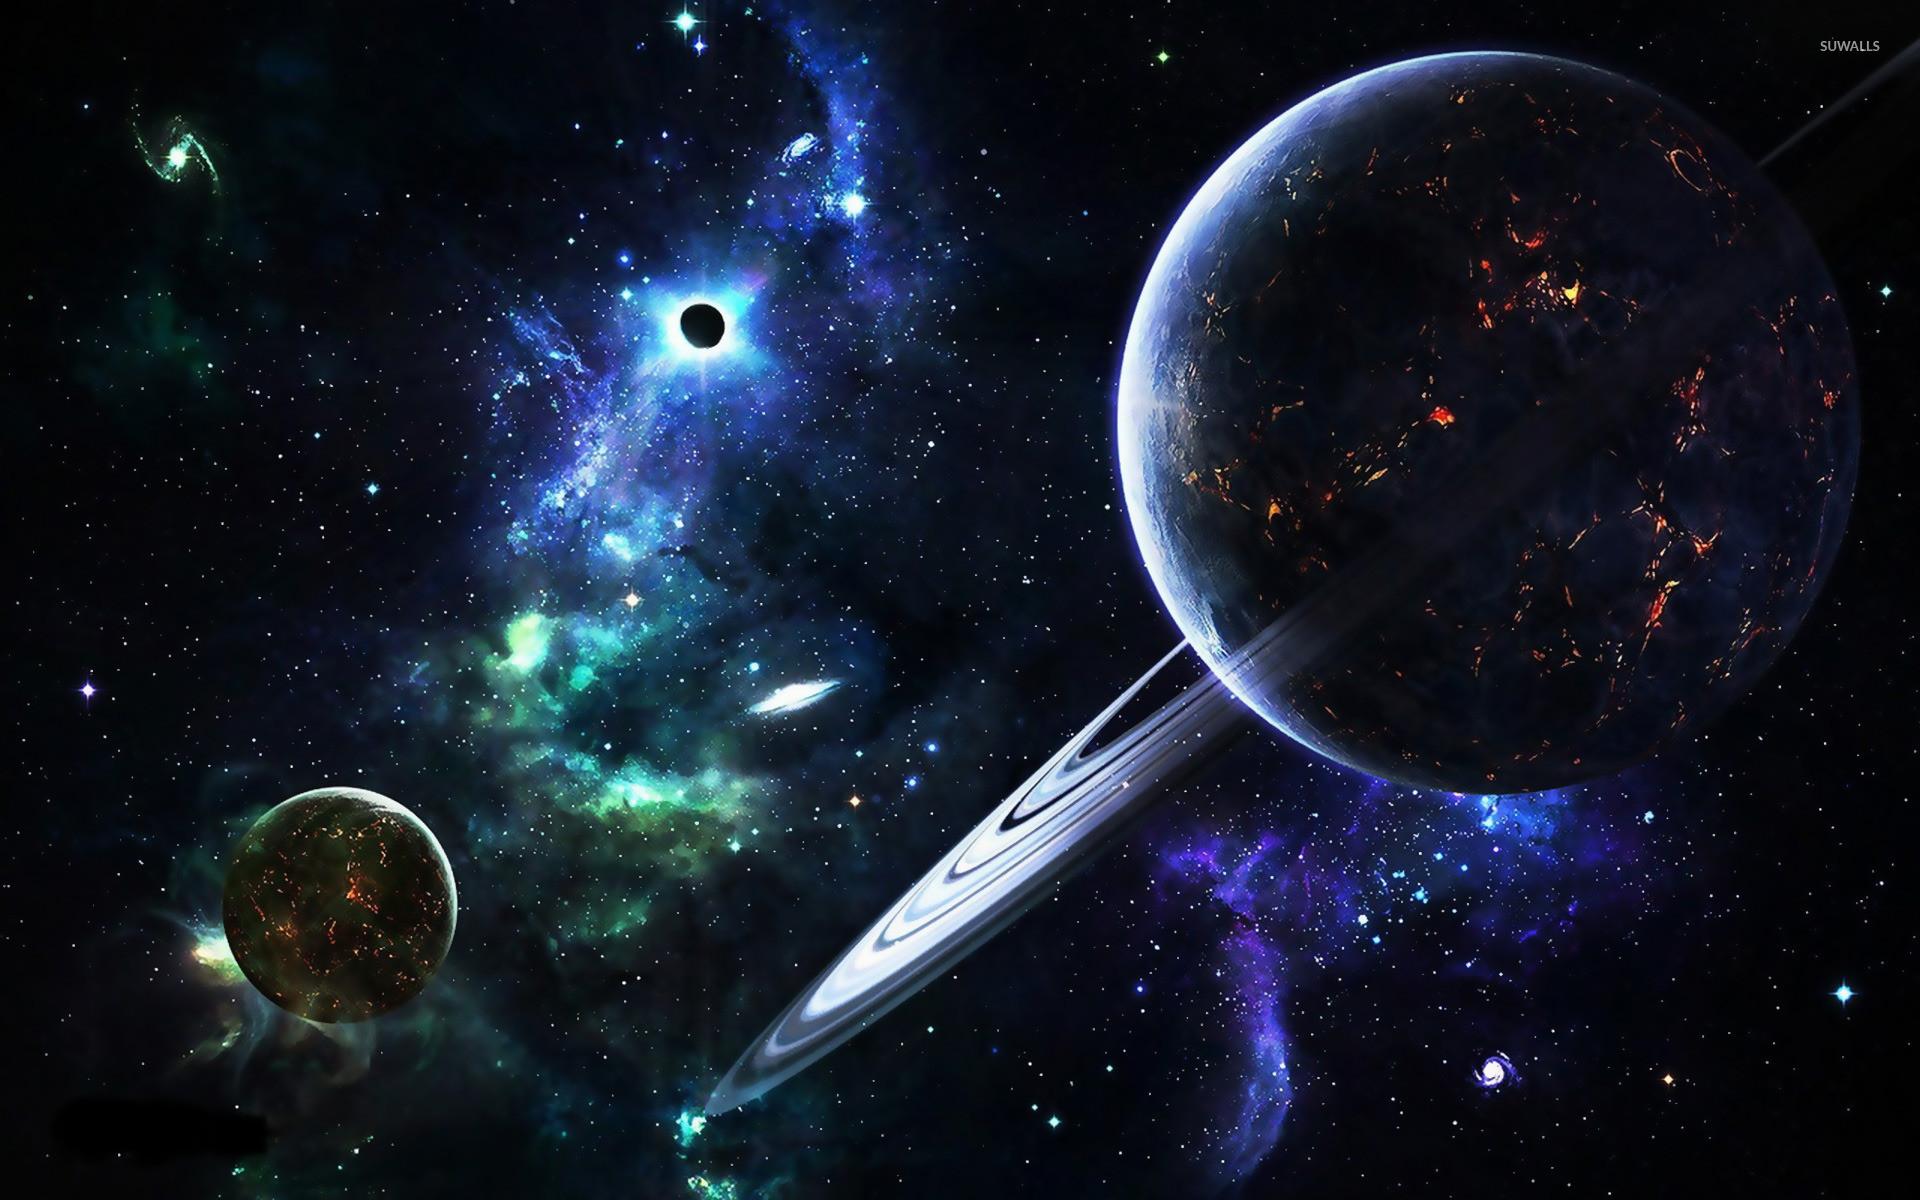 Planets and galaxies wallpaper – Fantasy wallpapers –